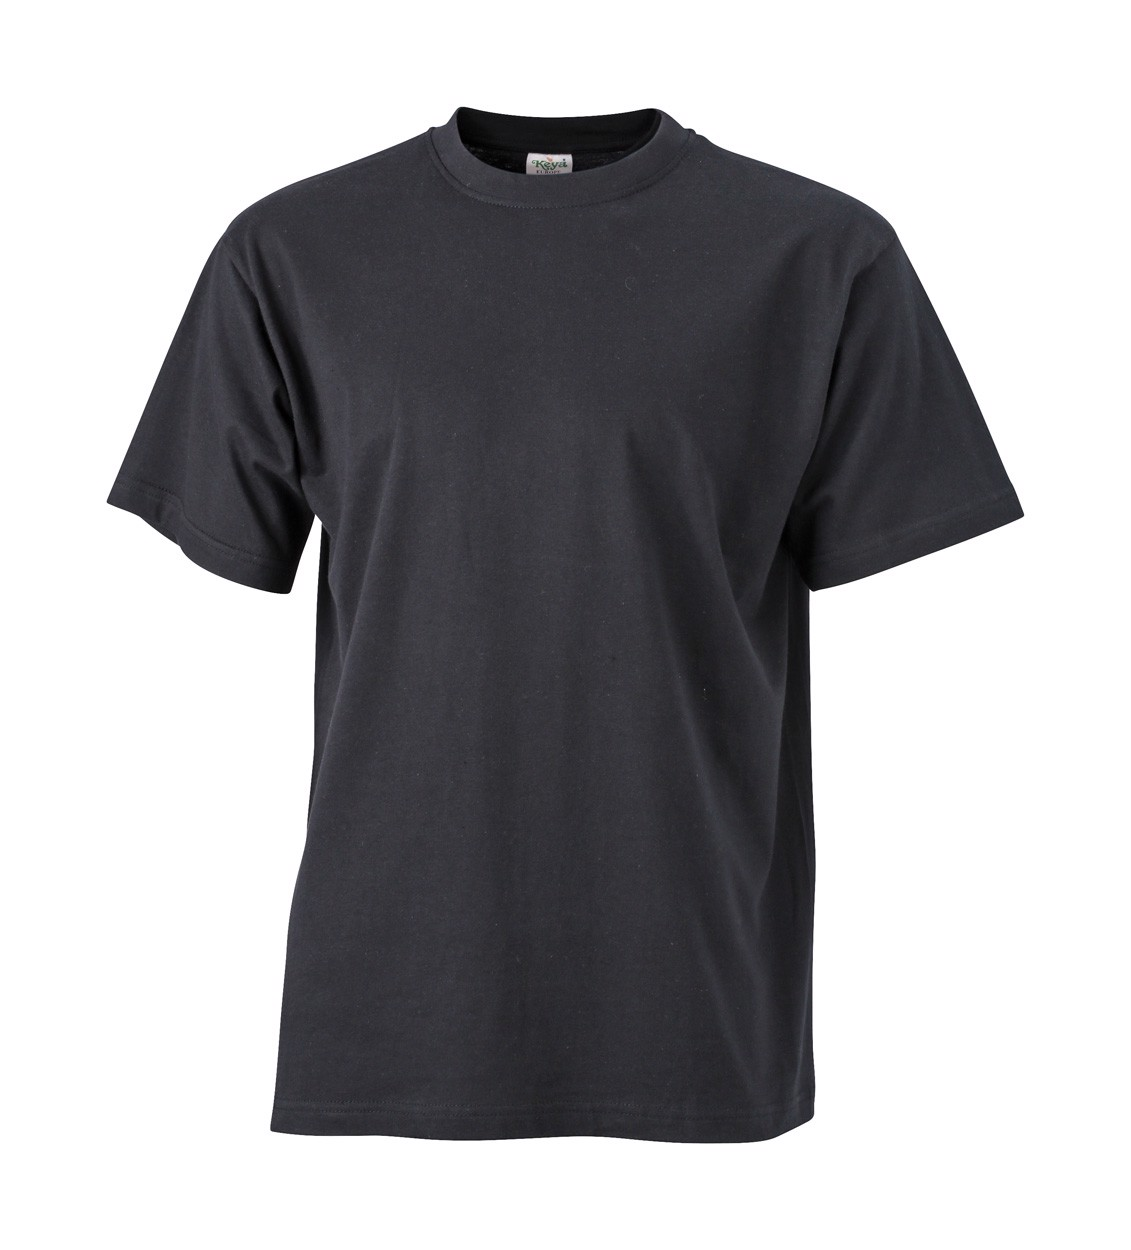 Tricou Keya 180 - Negru / L